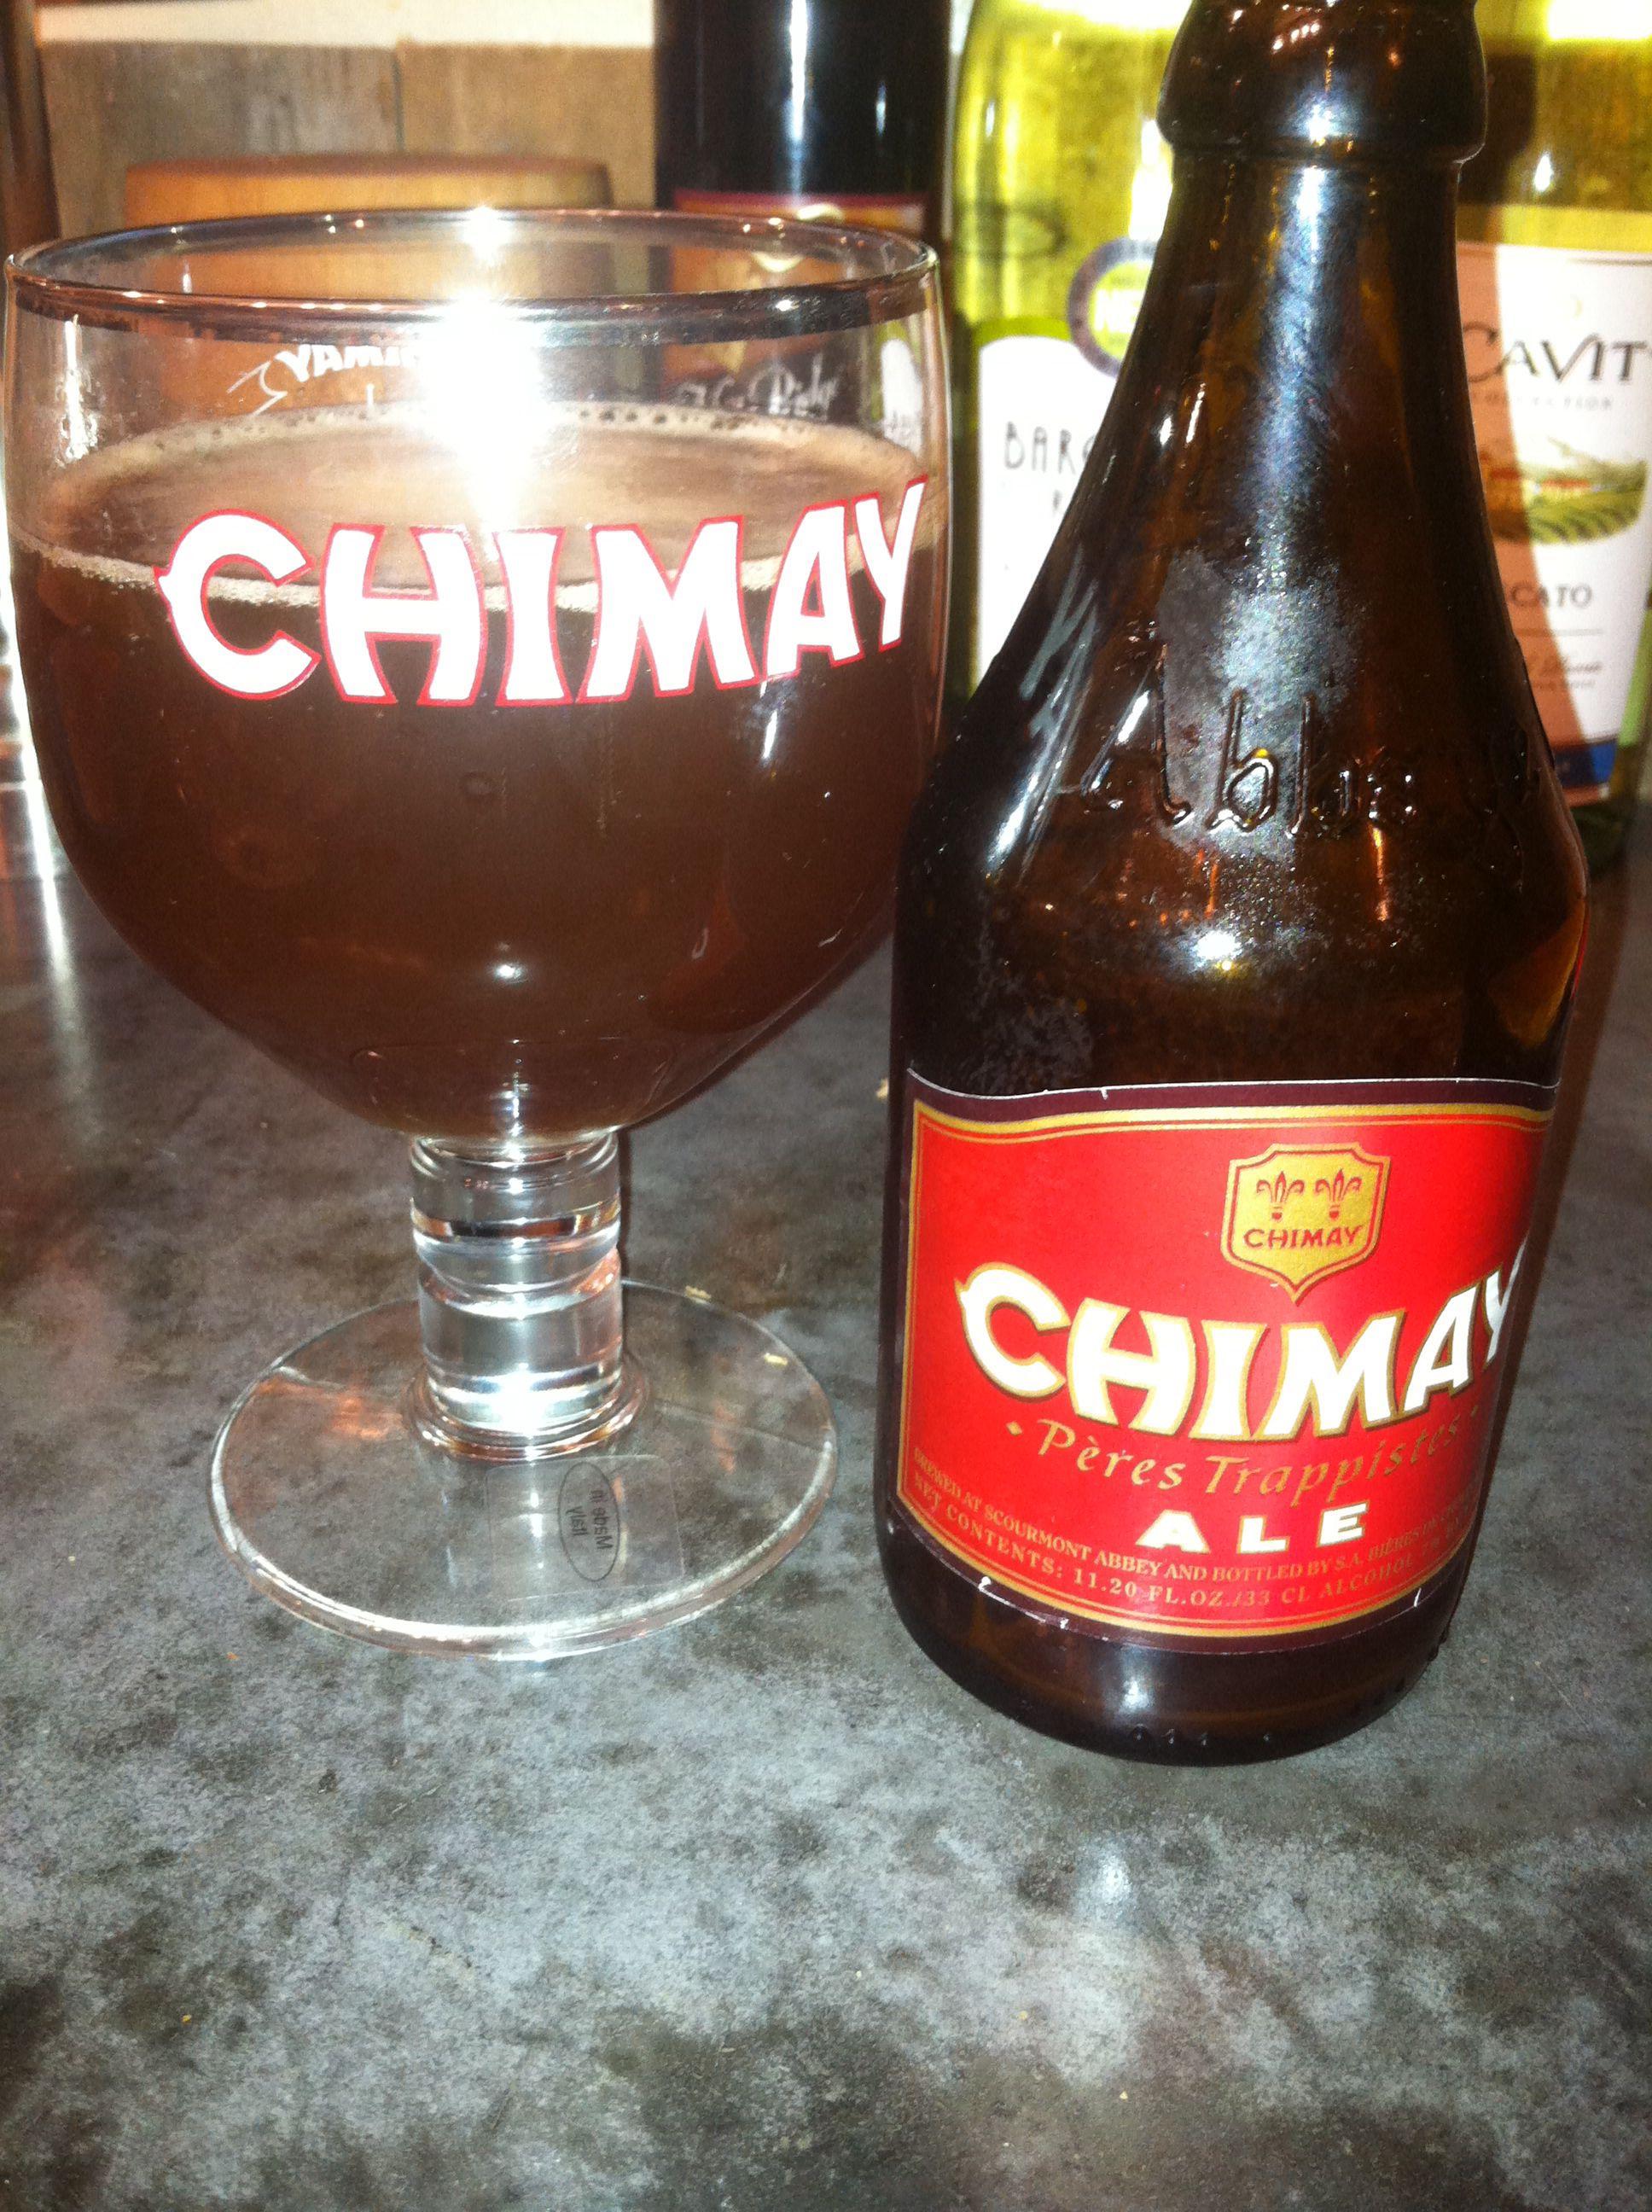 Chimay Red Beer Bottle Beer Bottle